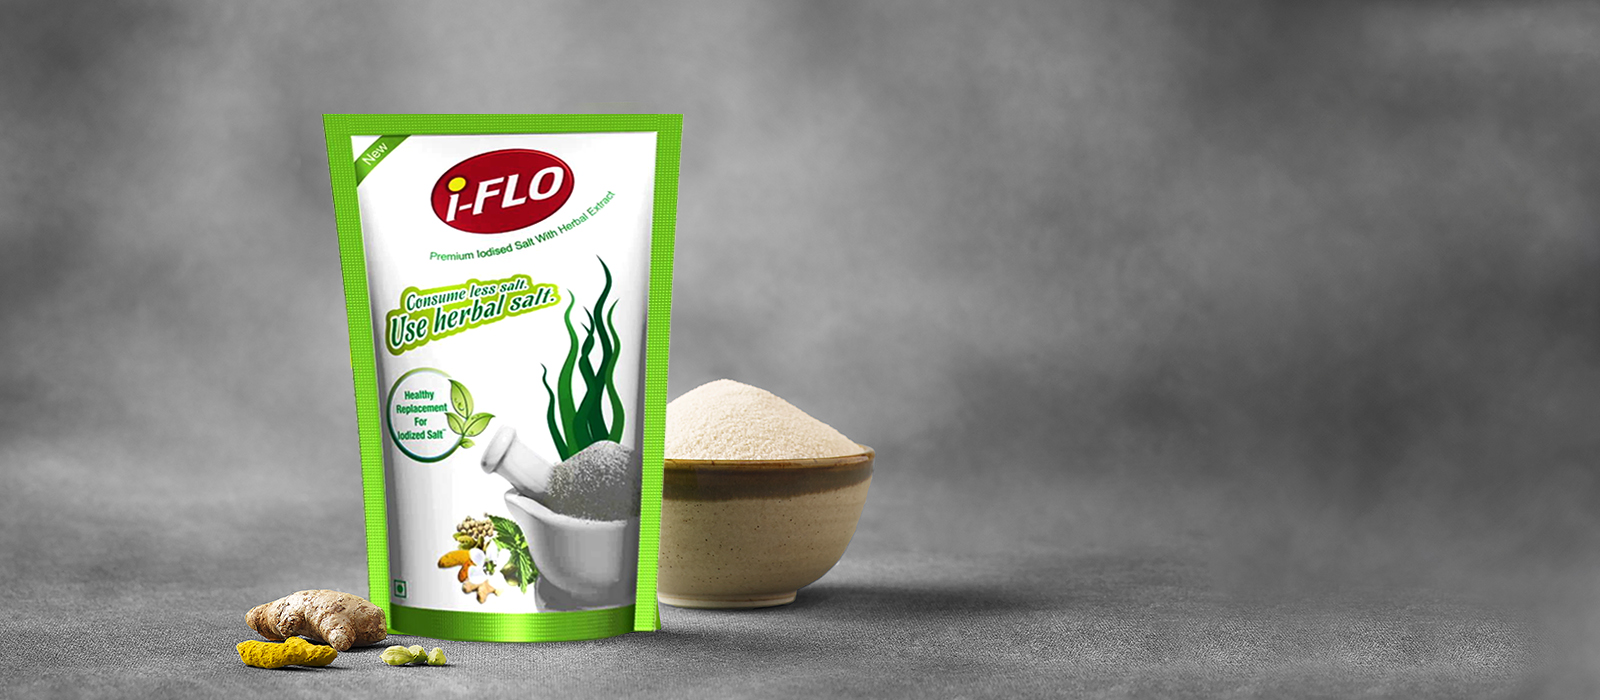 IFLO herbal salt